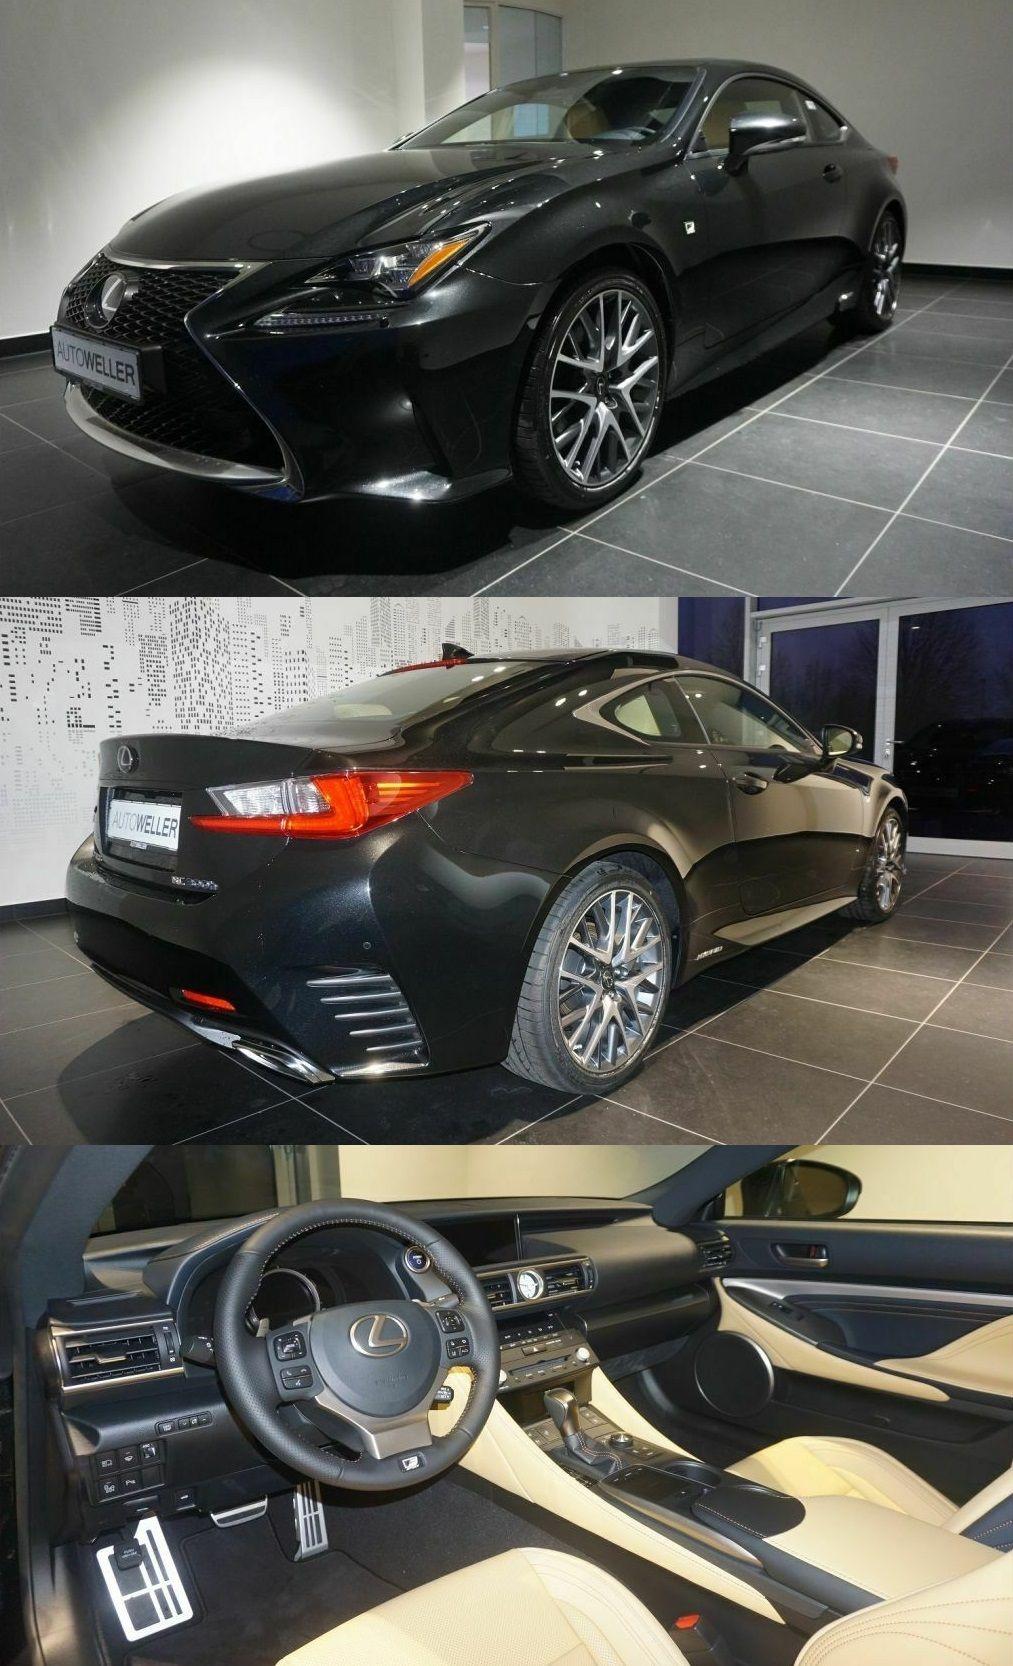 Lexus RC 300h F SPORT Lexus cars, Luxury cars, Lexus models